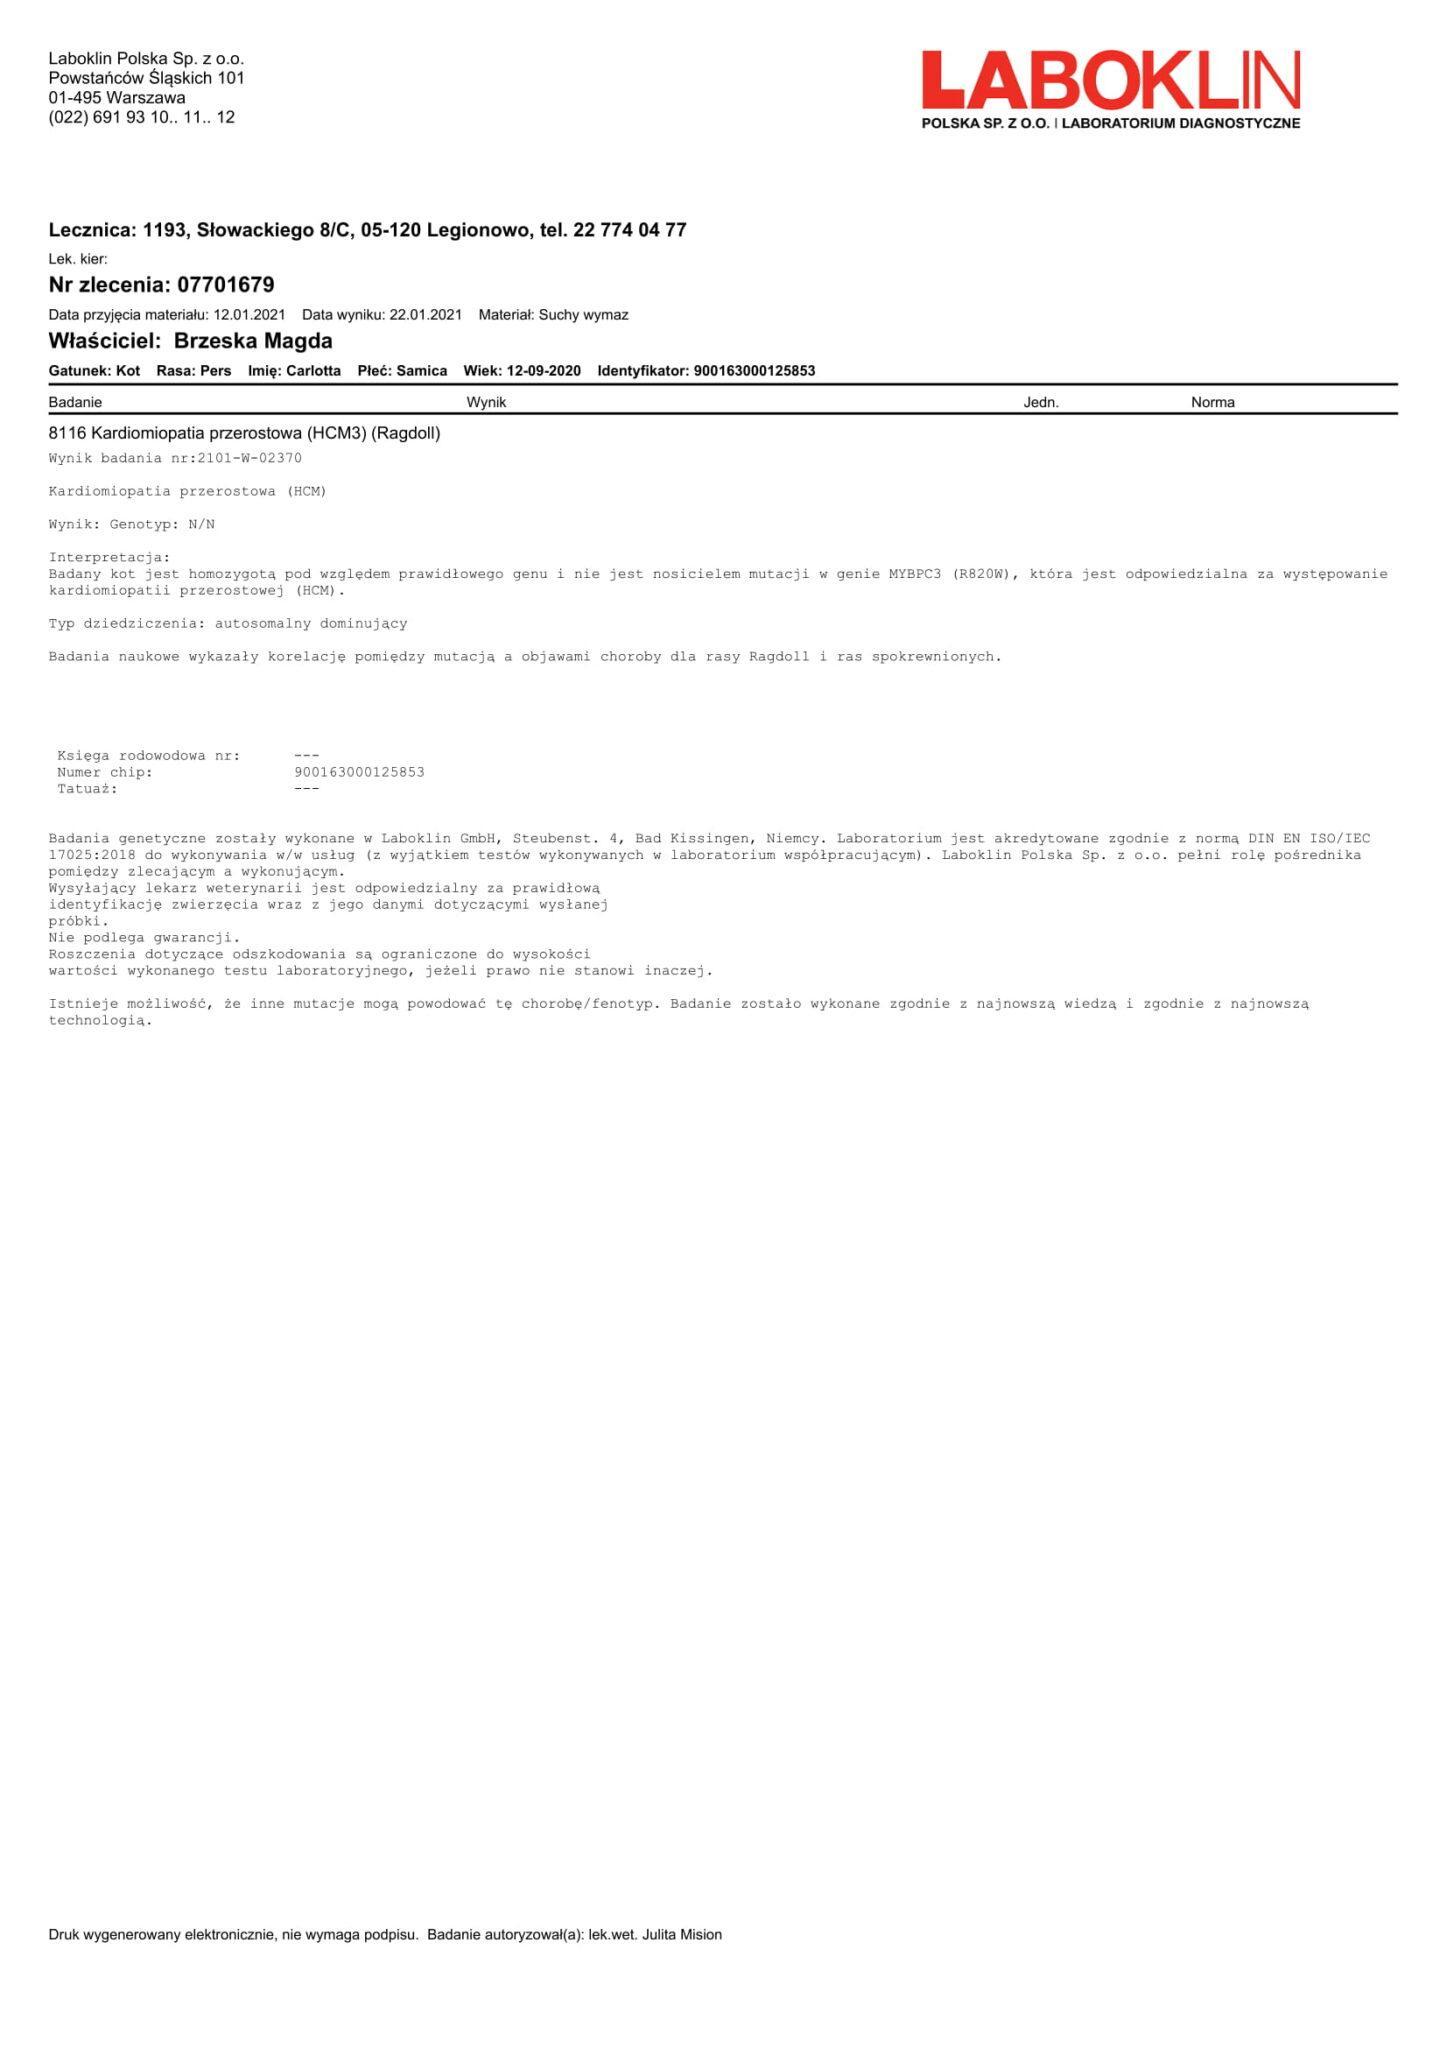 Brzeska-Magda-07701679-22.01.2021-1_4-4-1 Breeding